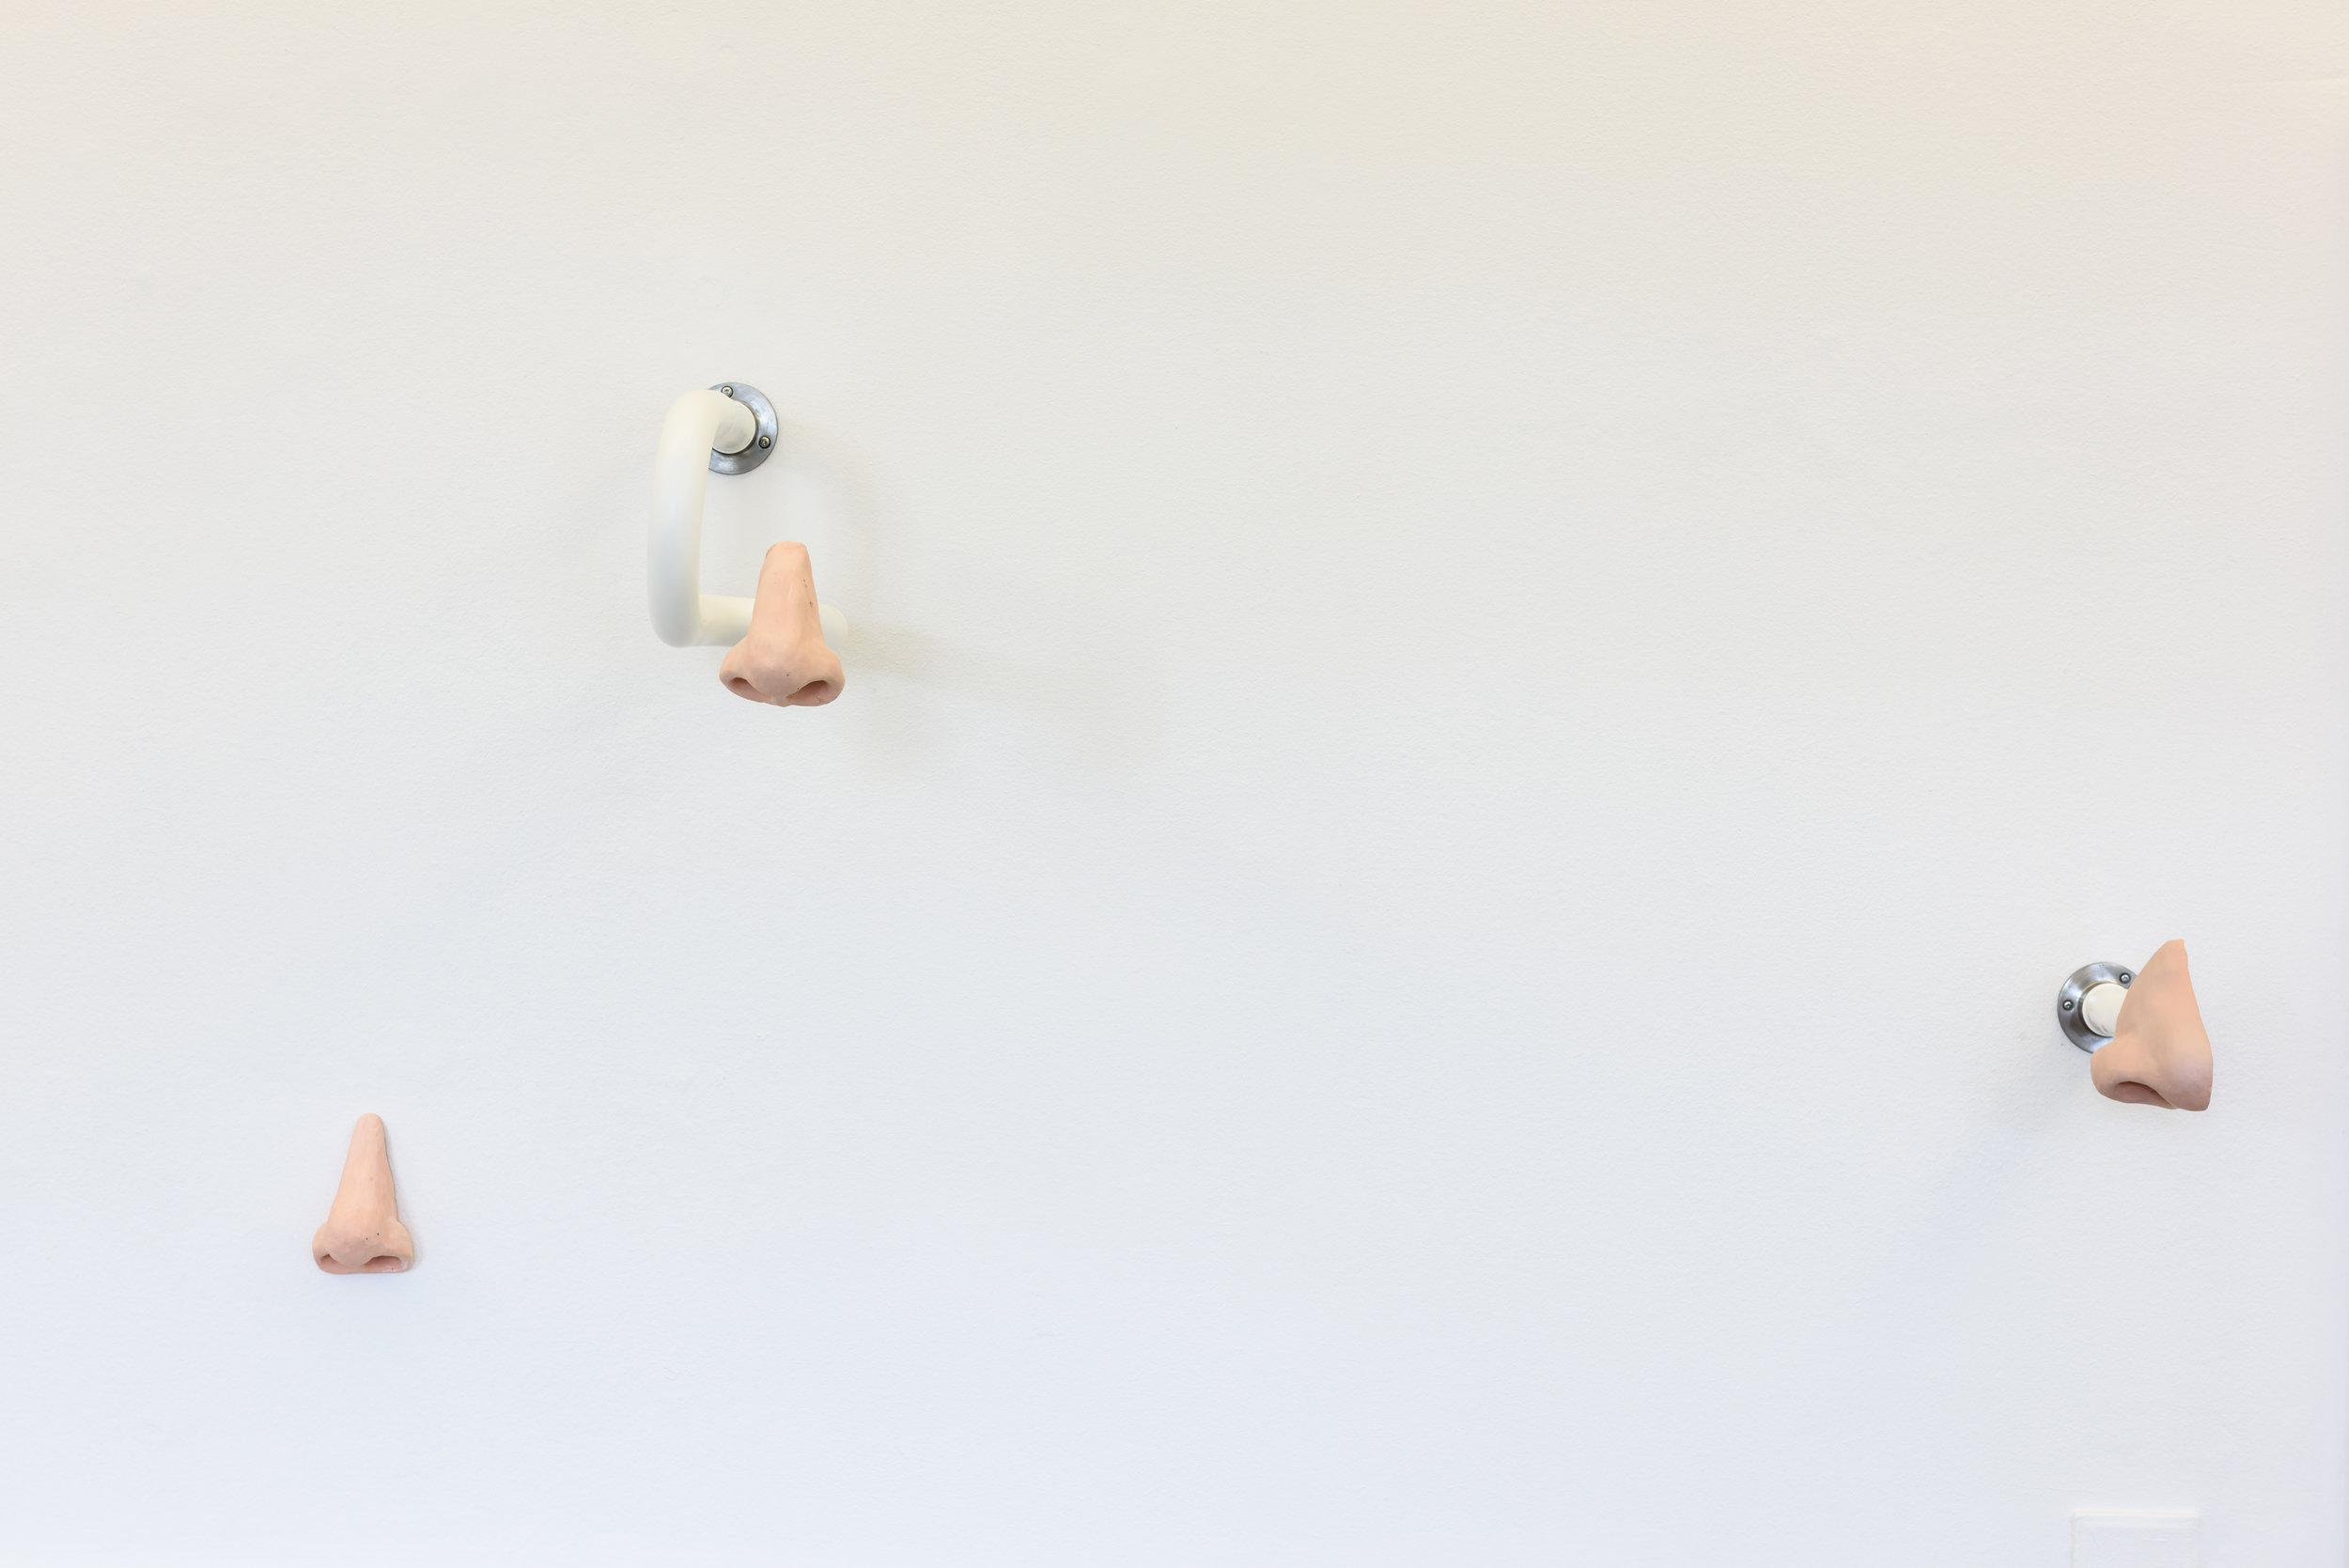 Nasothek, 2017 (c) Alastair Philip Wiper